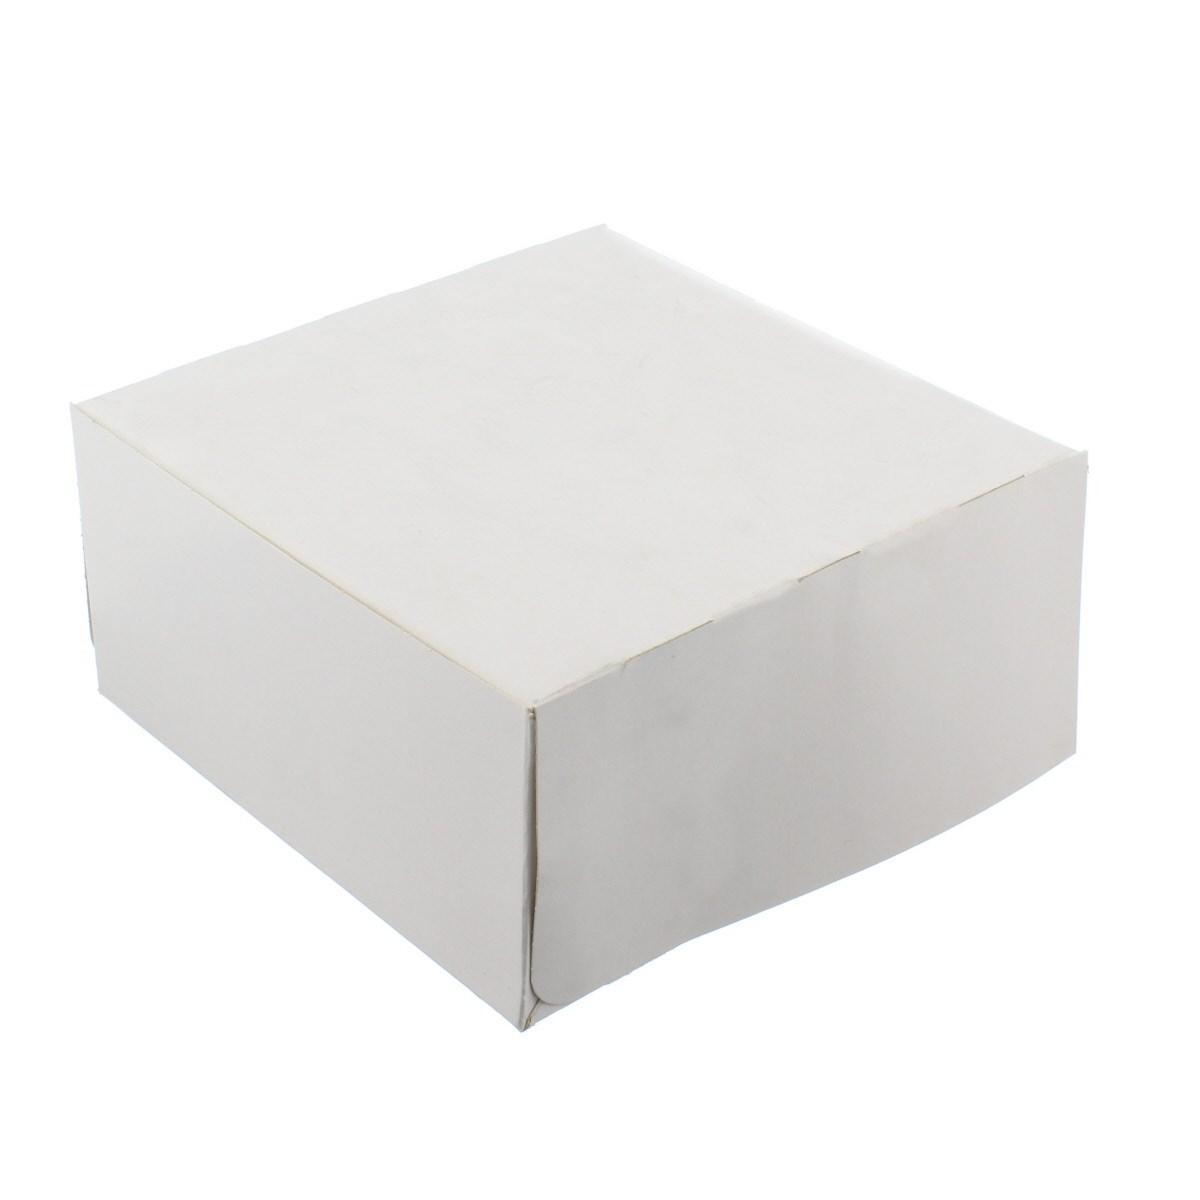 Inch Cake Box